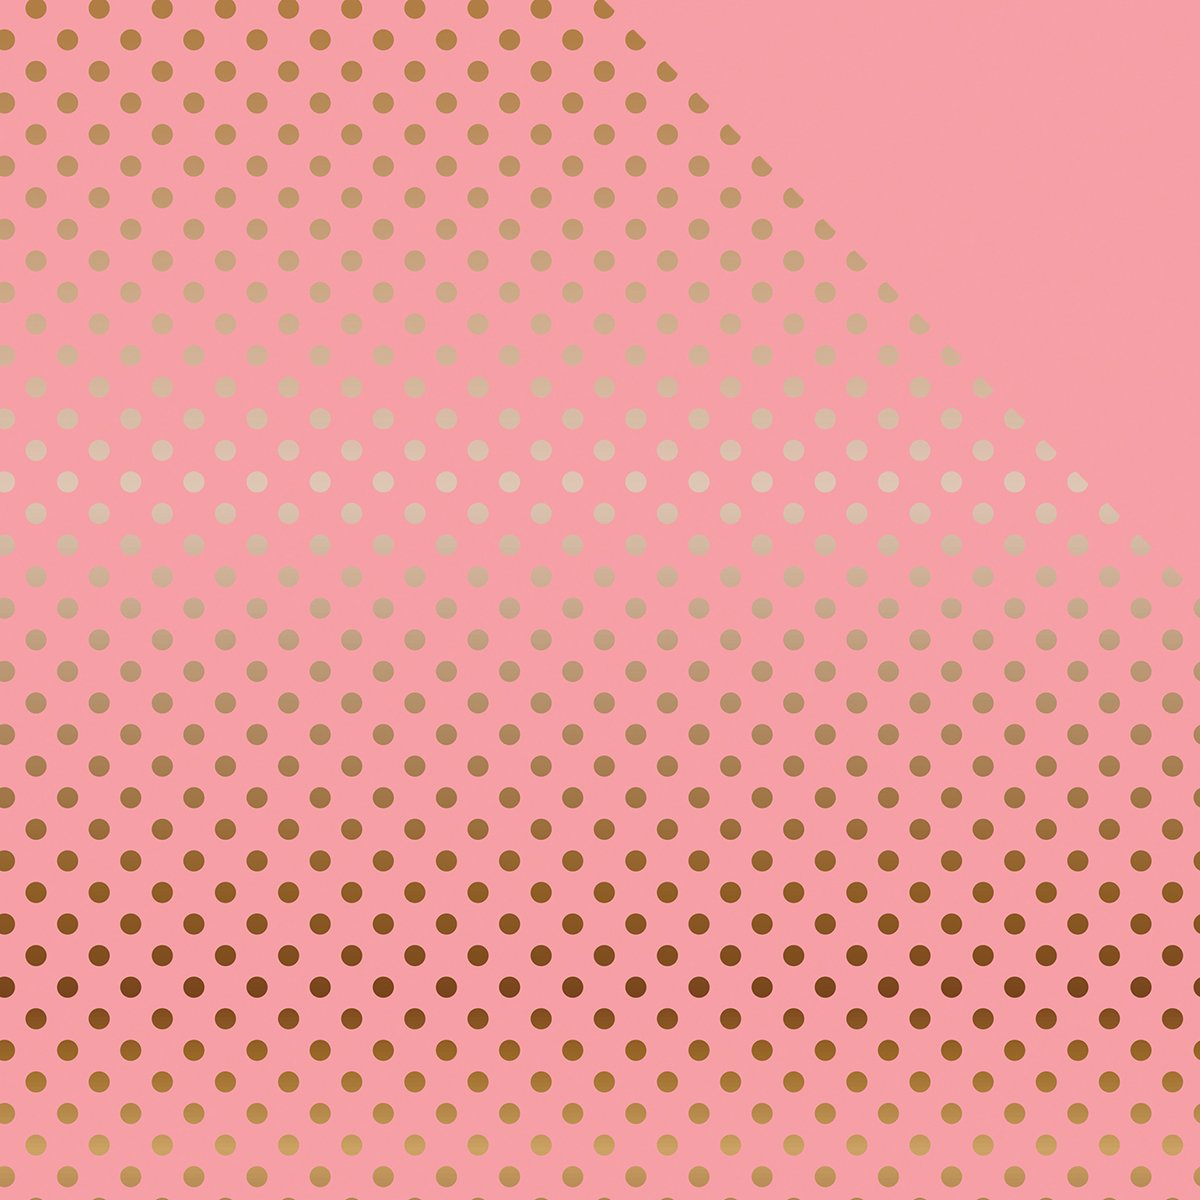 Echo Park Paper DS16032 Foiled Dots & Stripes Cardstock (15 Sheets Per Pack), 12 x 12, Pink/Copper by Echo Park Paper B01CUY4GQM